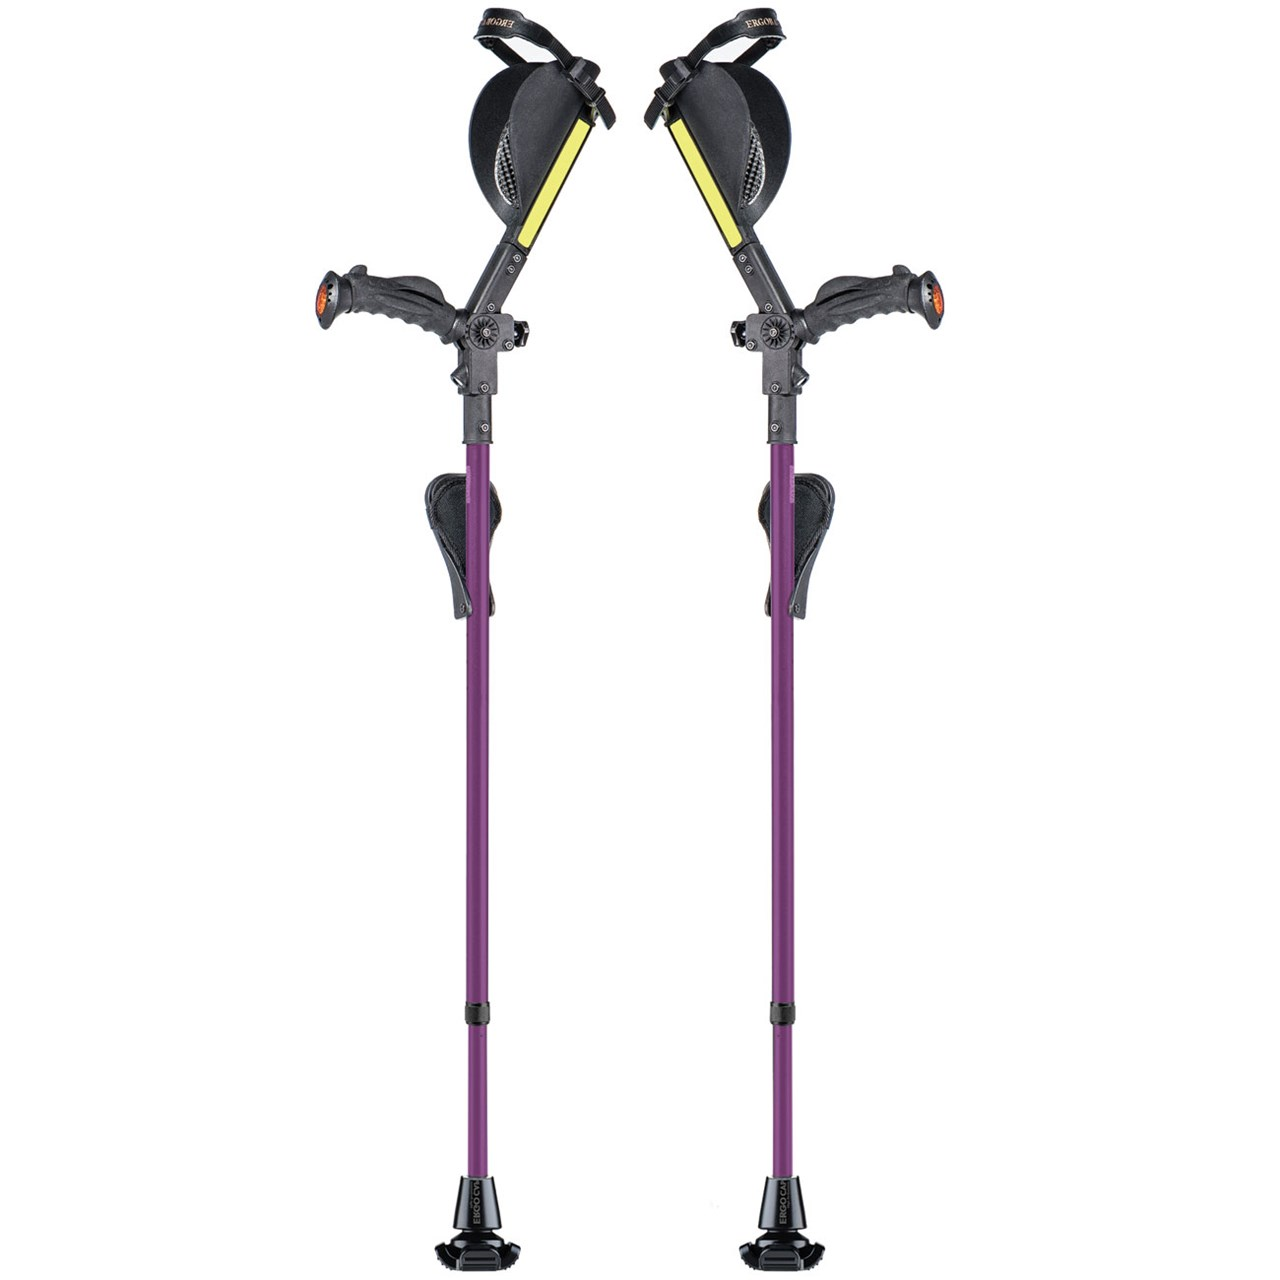 Ergobaum Ergonomic Forearm Crutches - Adult - Purple